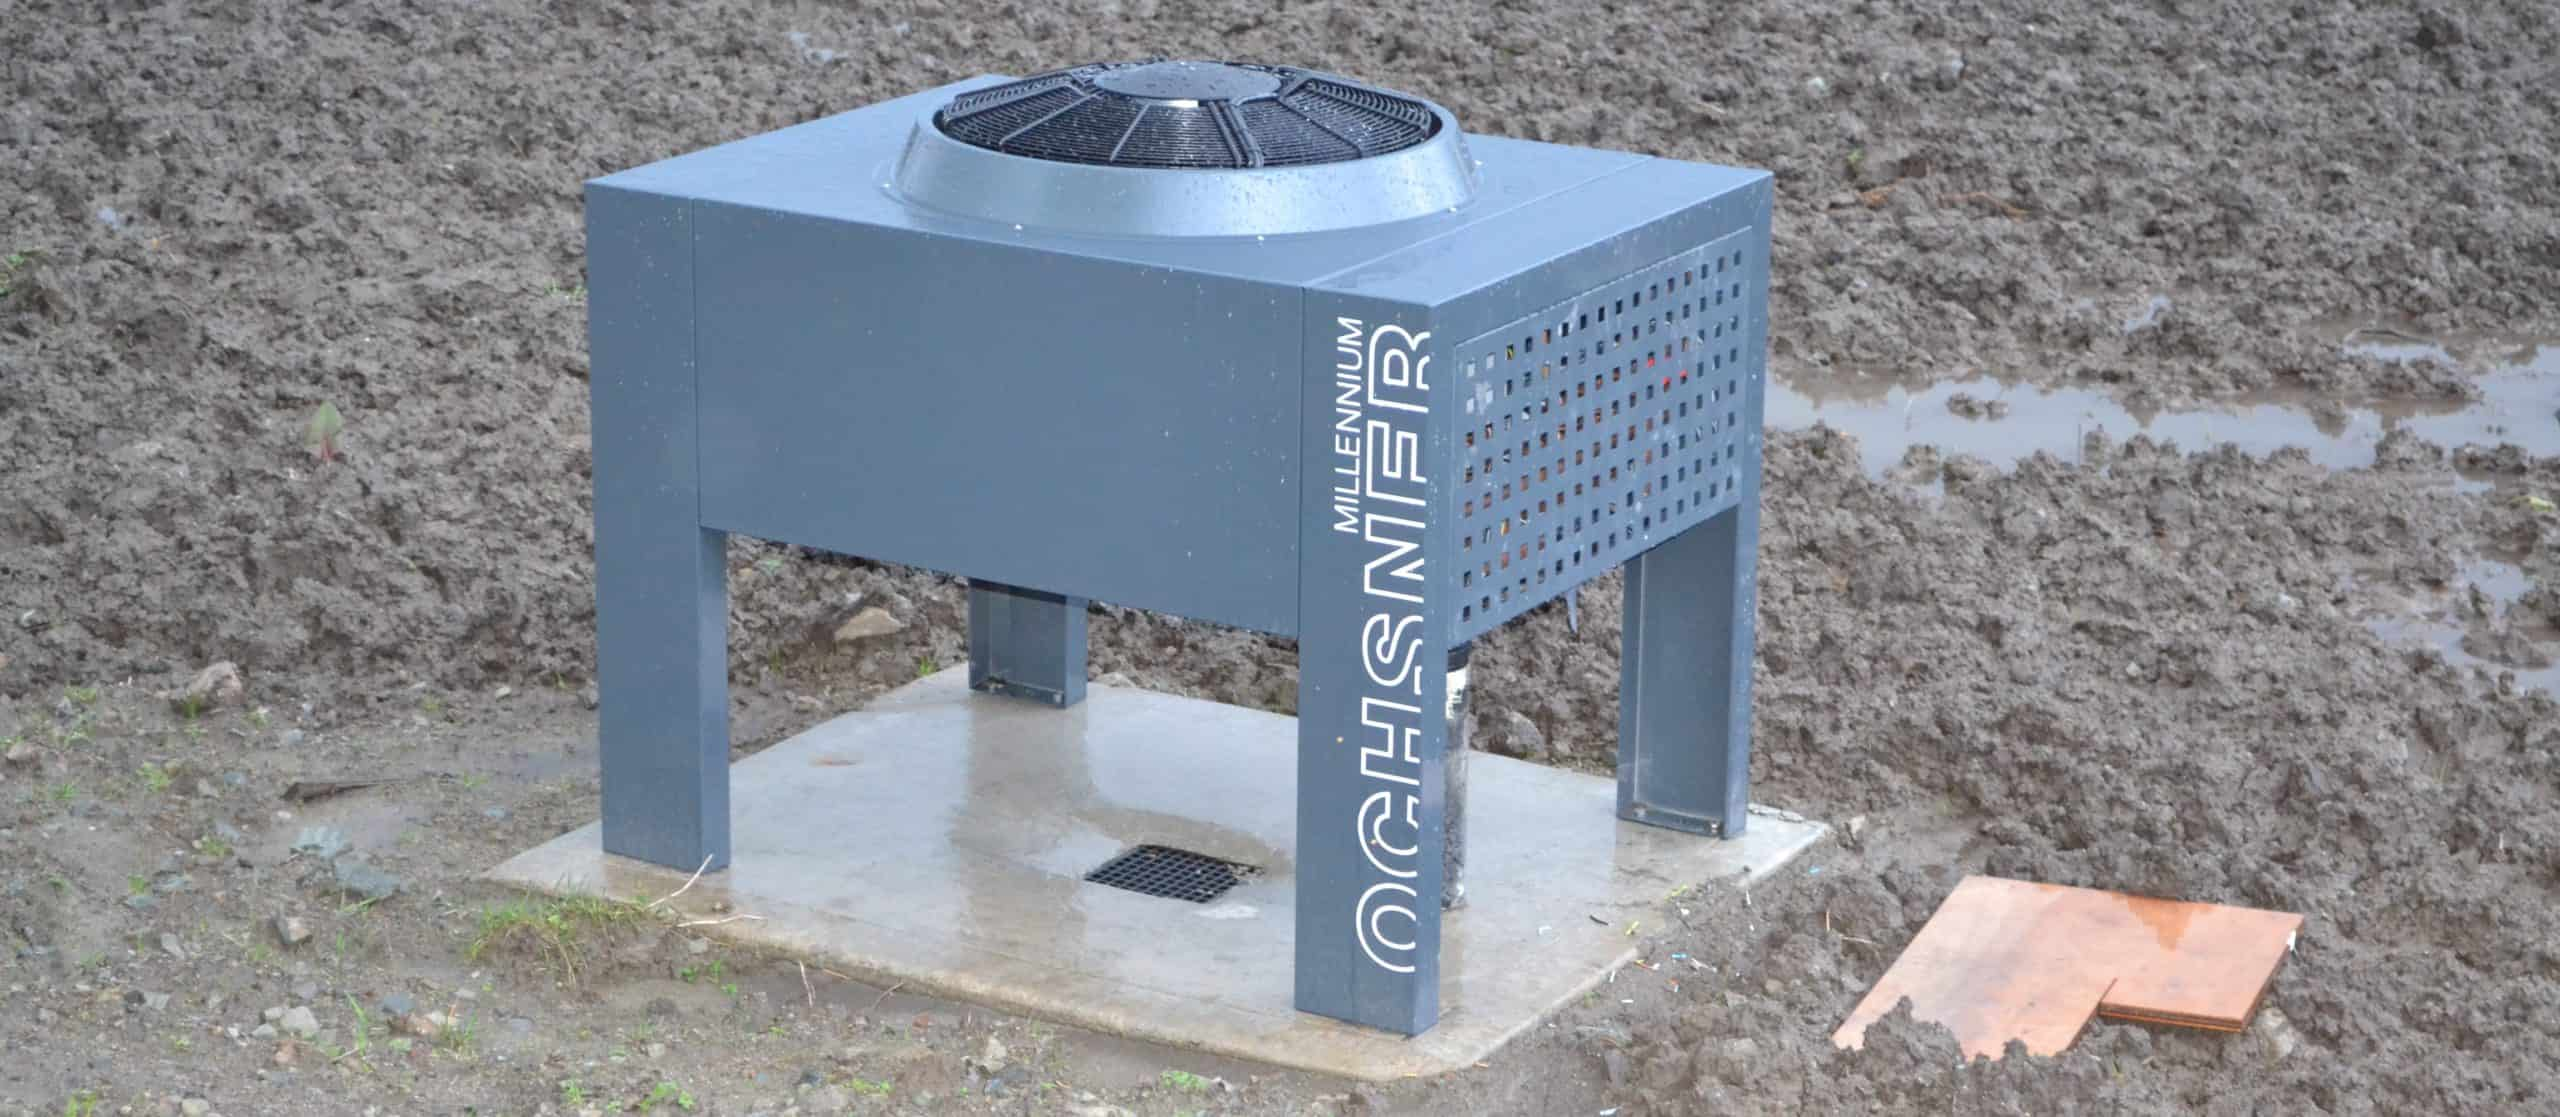 Quigg Dwelling - Heat Pump